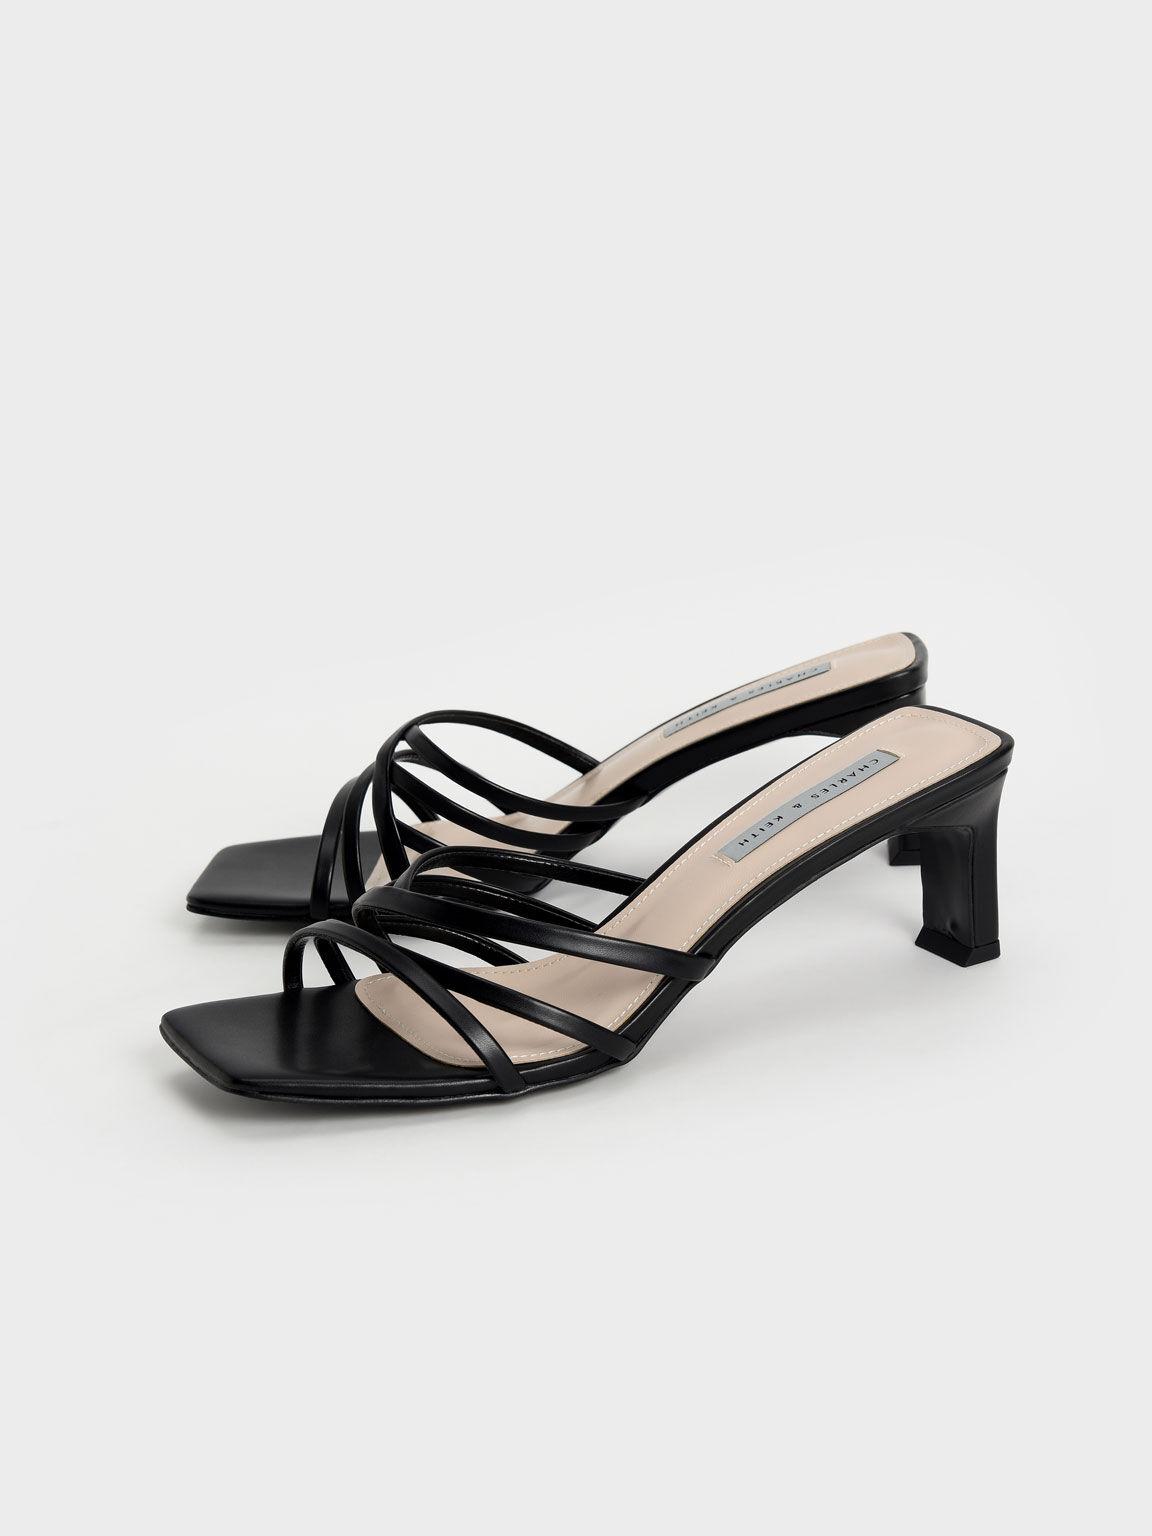 Asymmetric Strappy Sandals, Black, hi-res